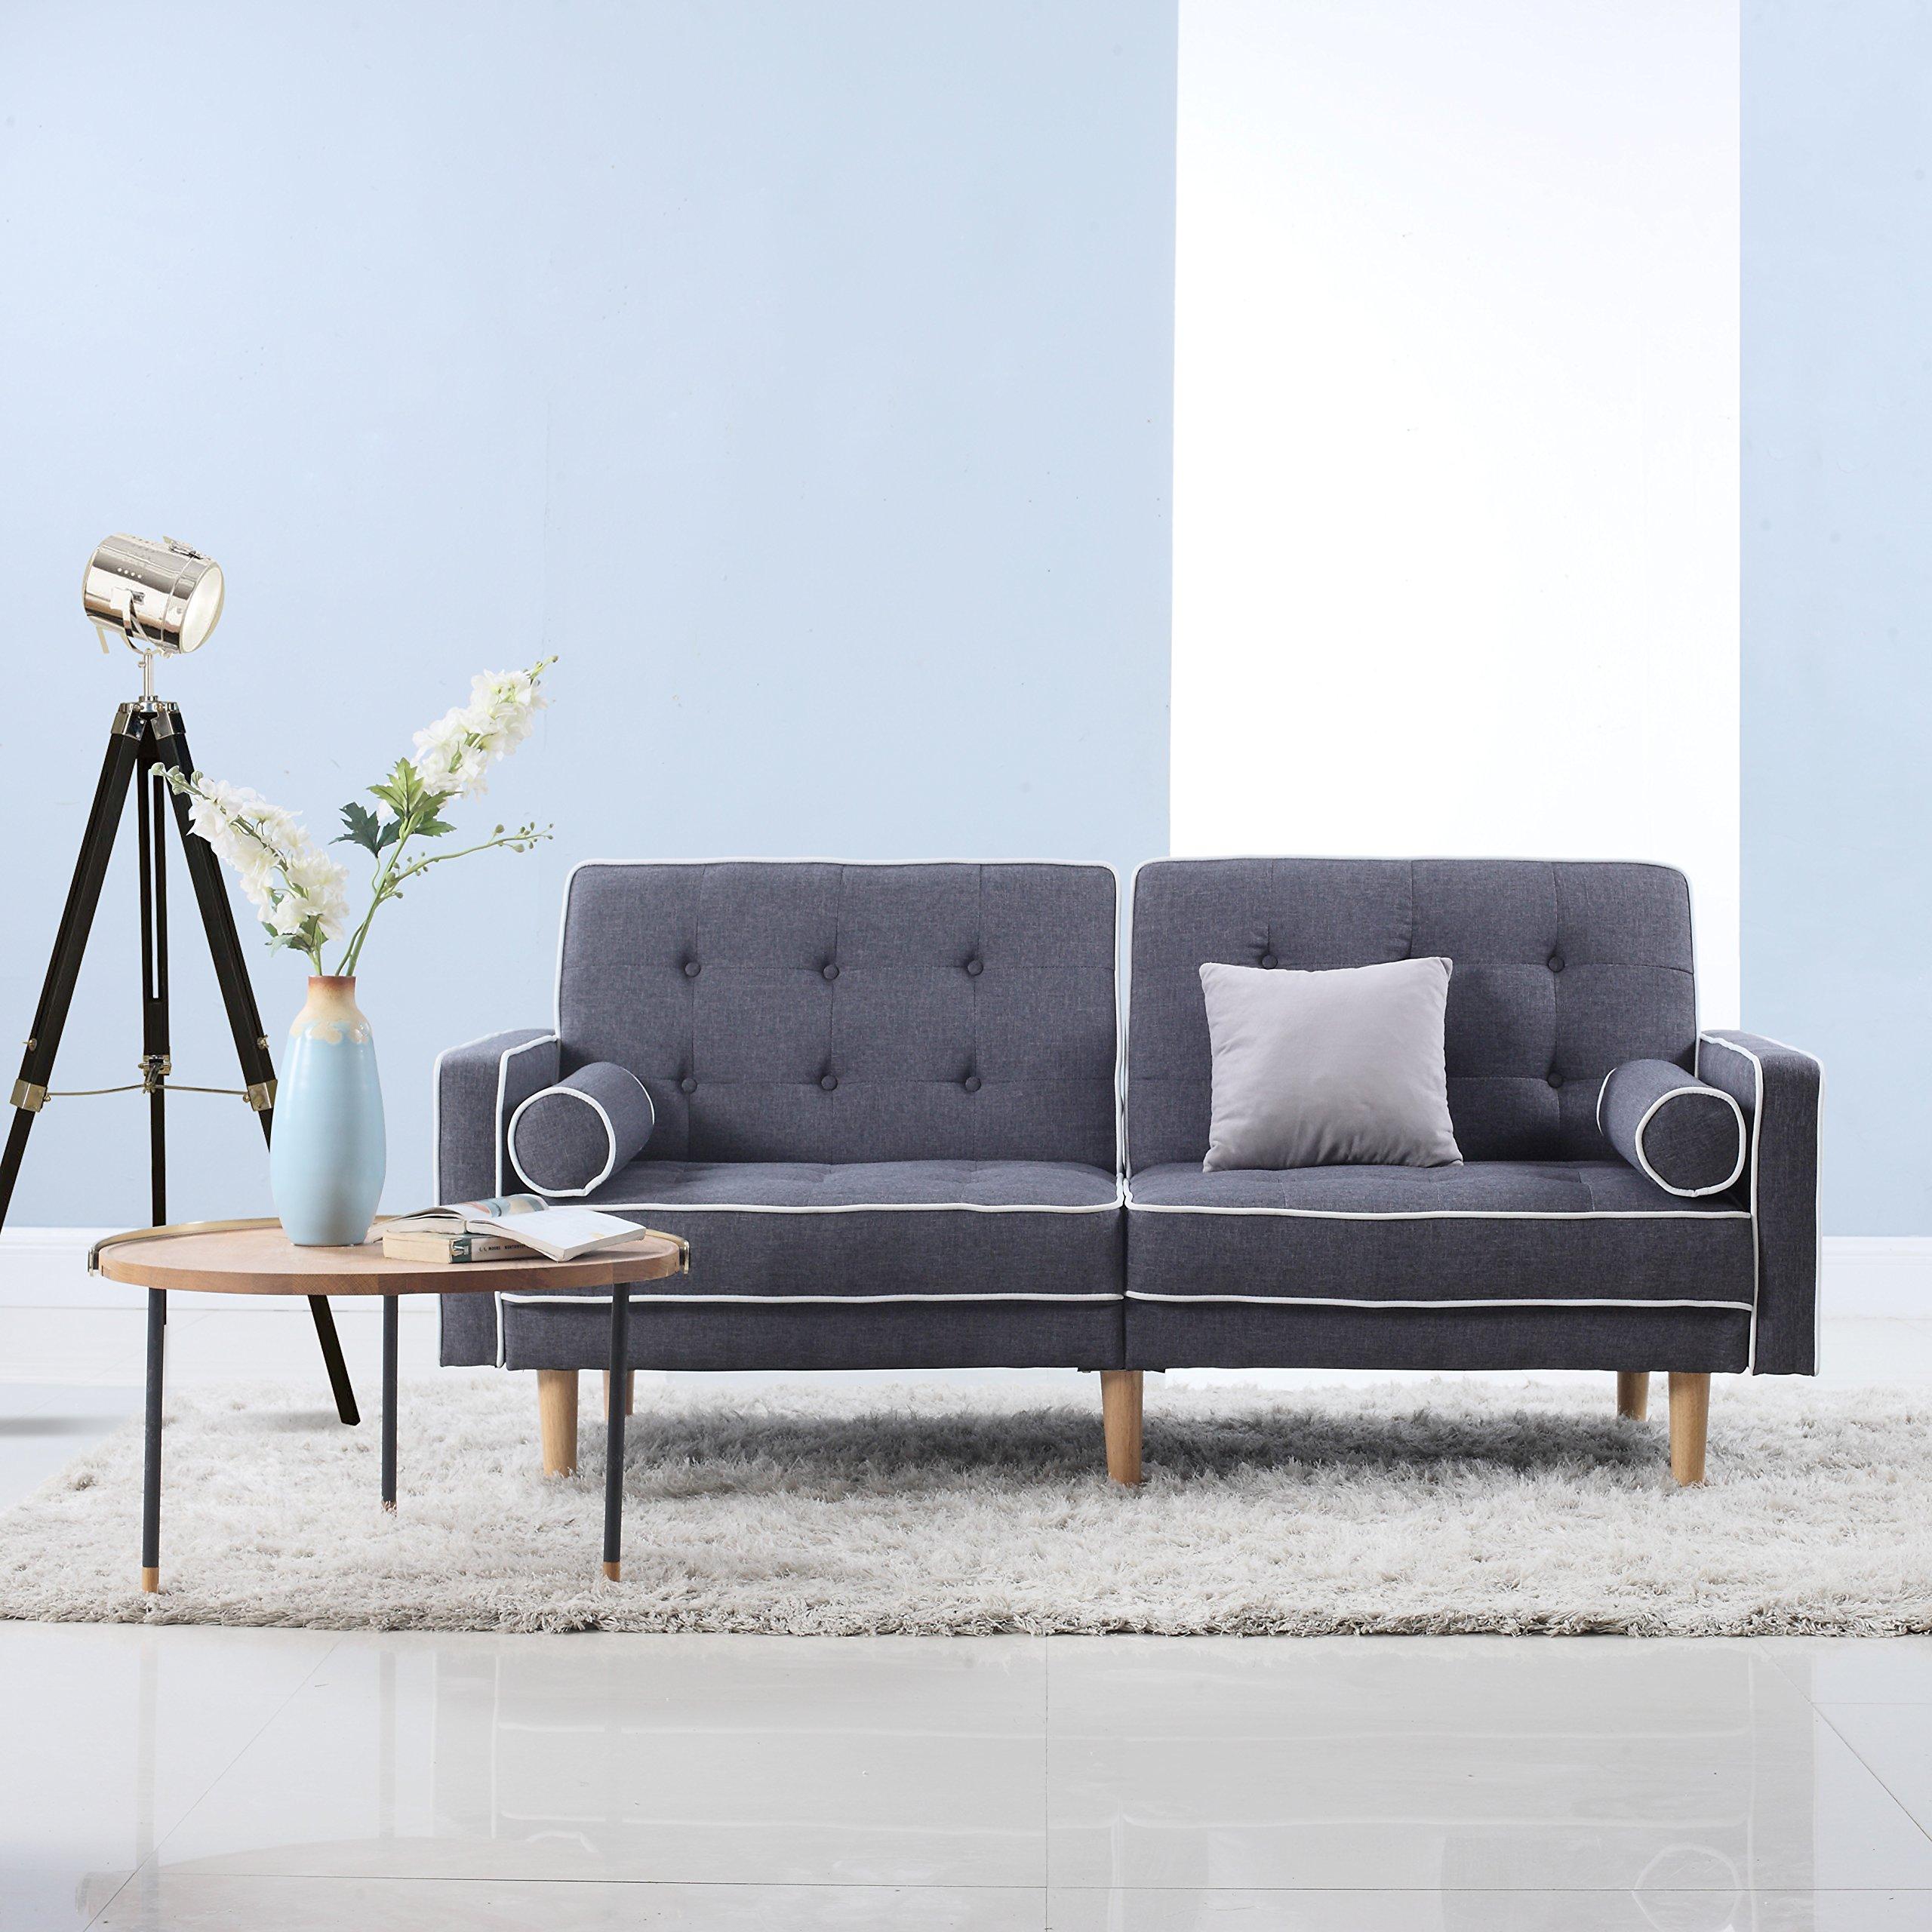 DIVANO ROMA FURNITURE Mid Century Modern Two Tone Splitback Tufted Linen Fabric Futon (Dark Grey) by Divano Roma Furniture